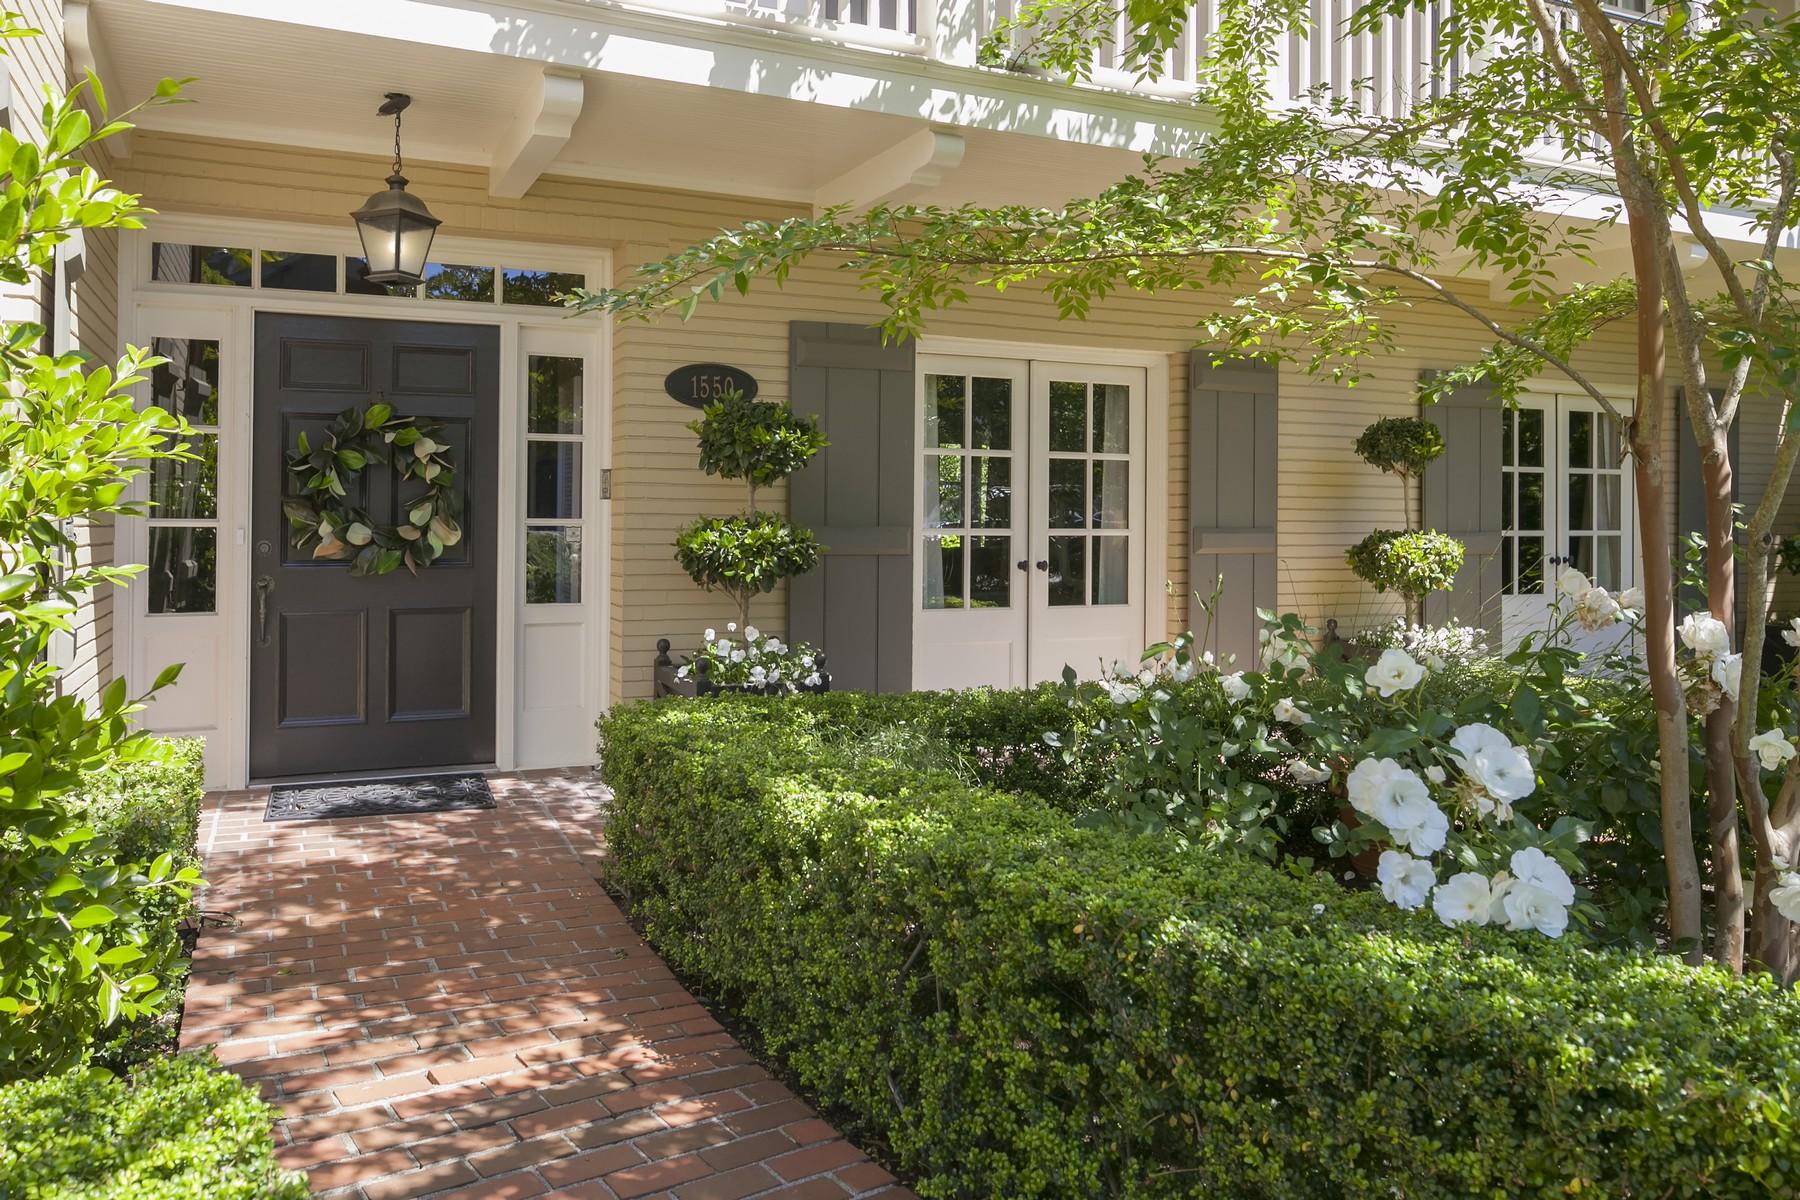 Villa per Vendita alle ore 1550 Shenandoah Dr E Seattle, Washington, 98112 Stati Uniti